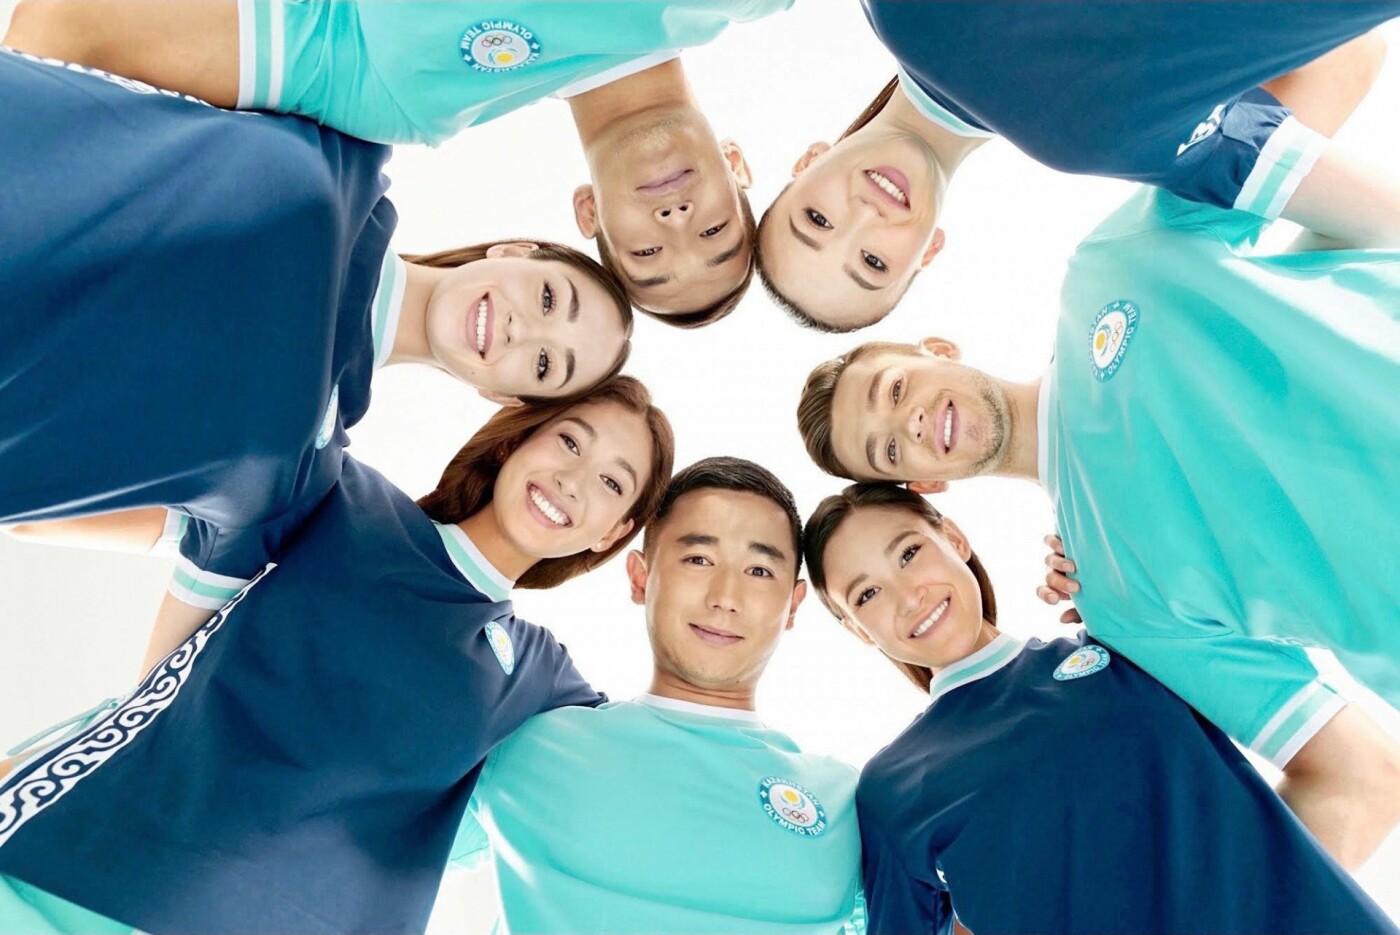 Новую олимпийскую форму казахстанских спортсменов представил НОК, фото-2